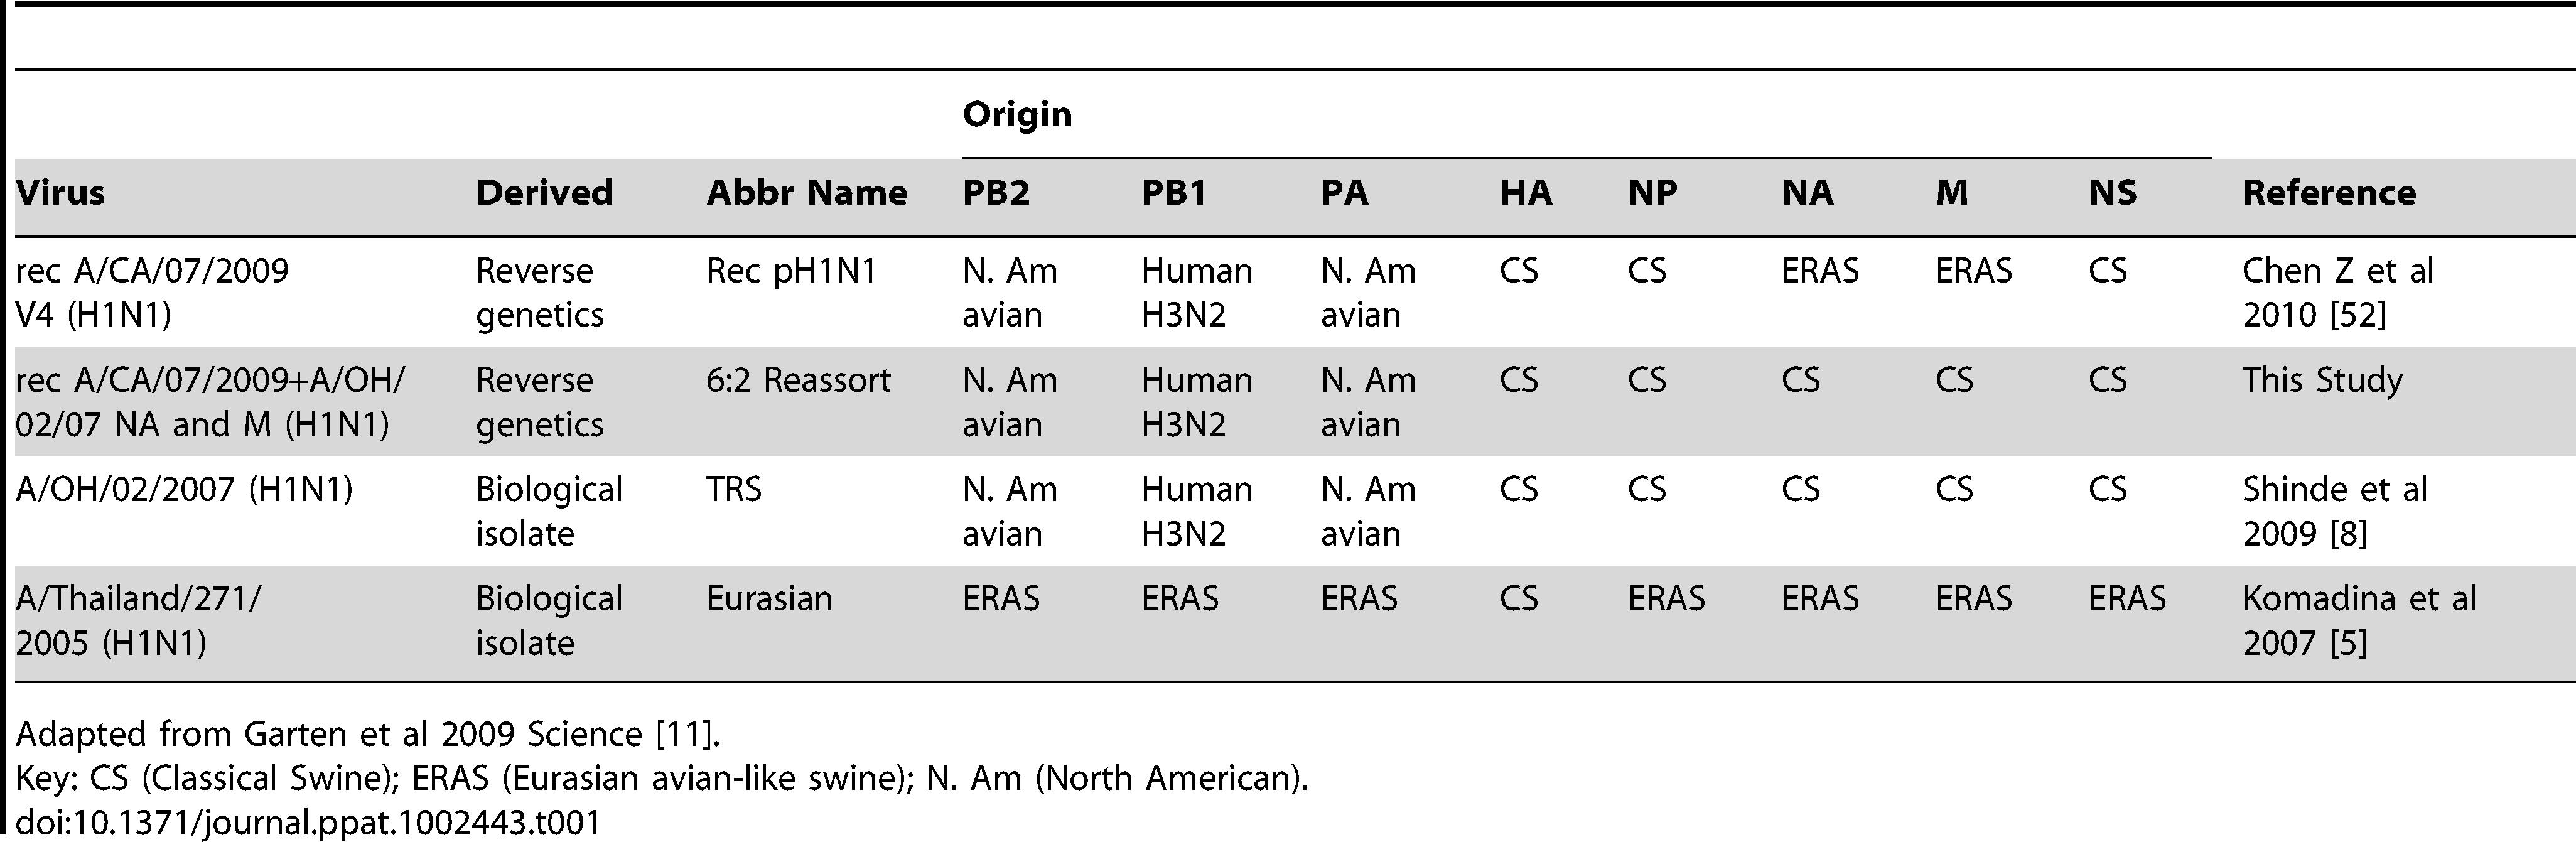 Genotype of the viruses.